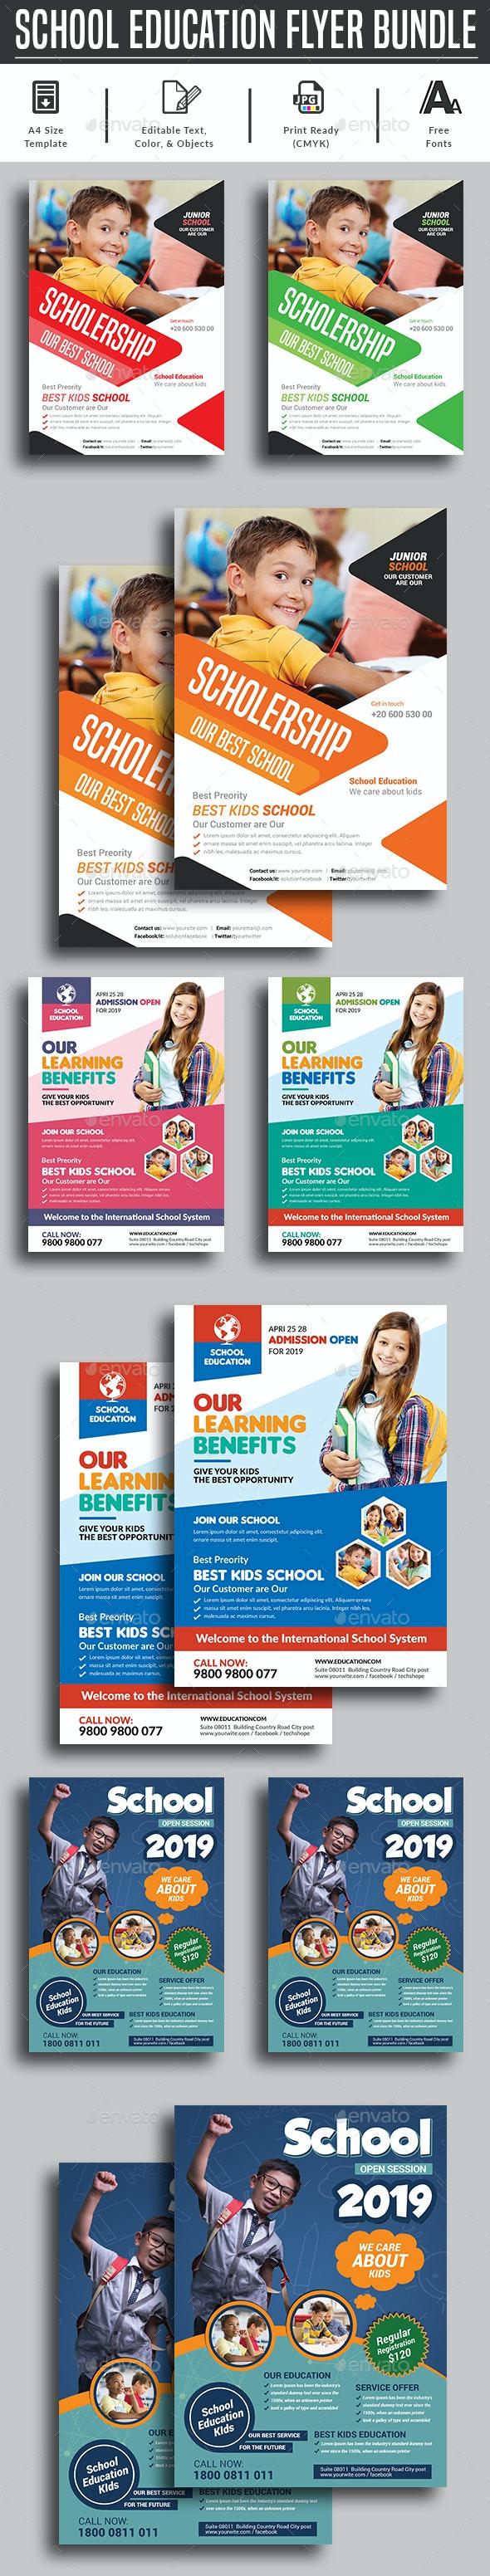 School Flyer Bundle Templates - Corporate Flyers